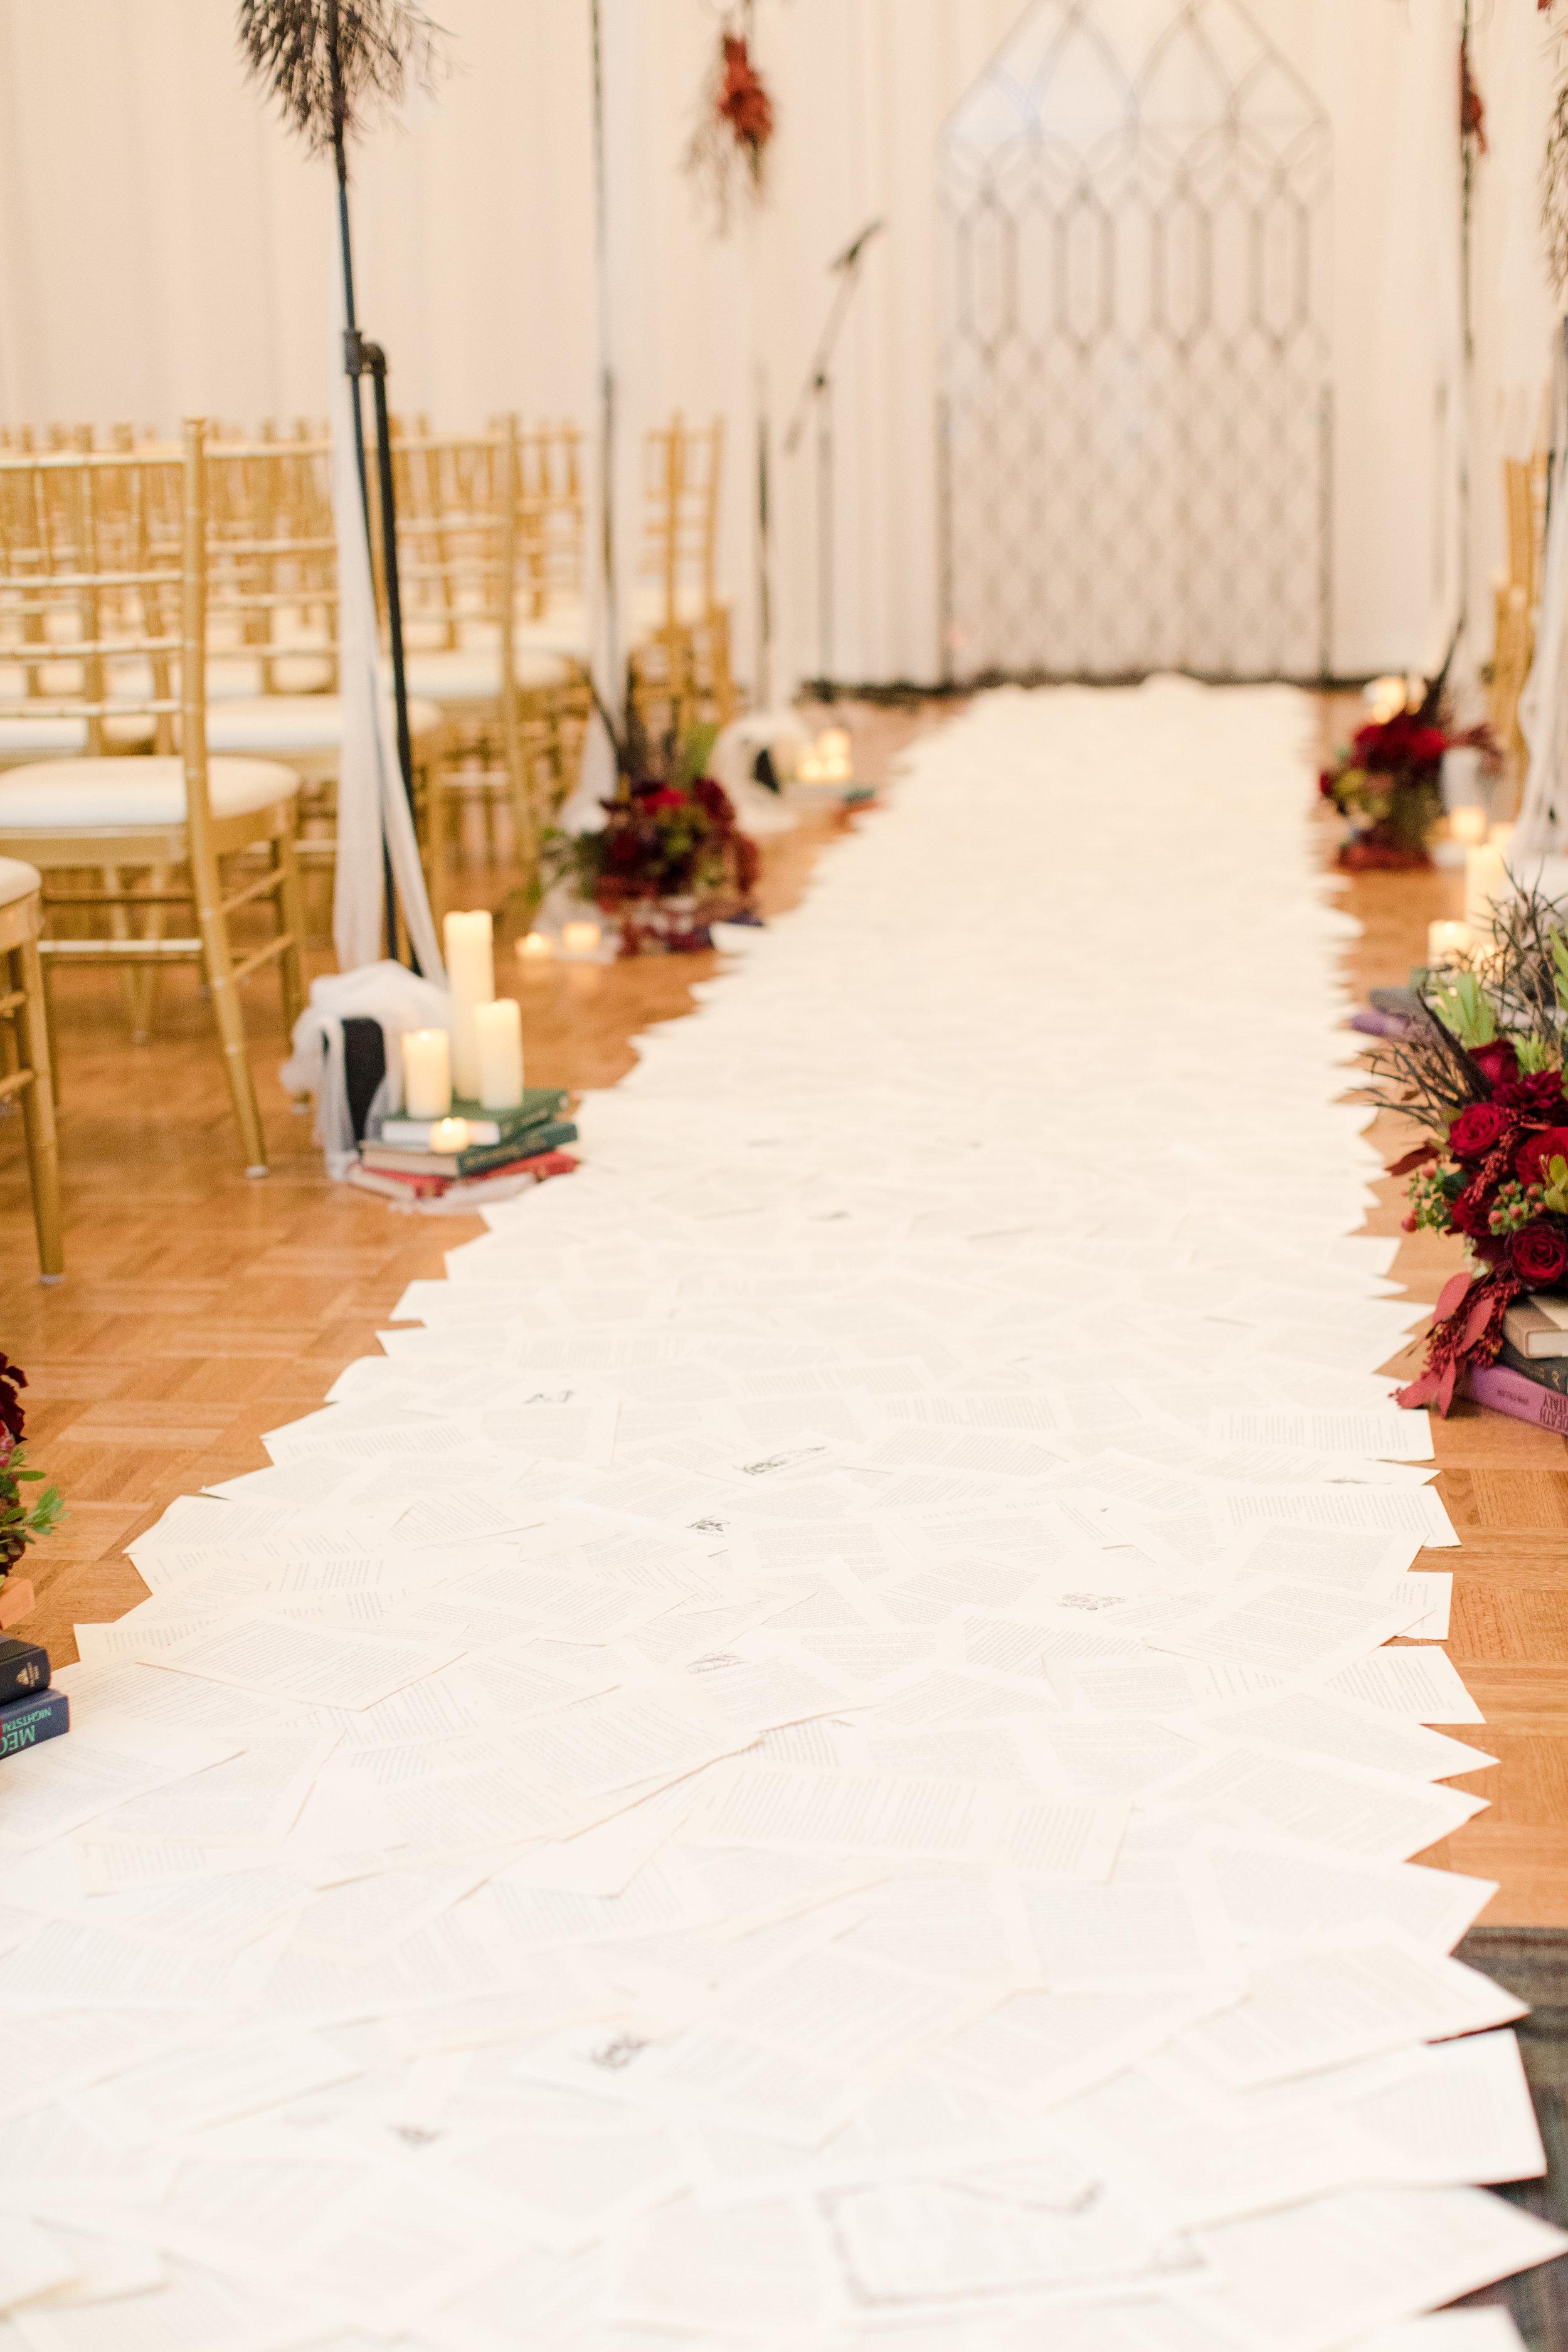 Book page aisle runner for library inspired wedding at Buona Sera Palazzo